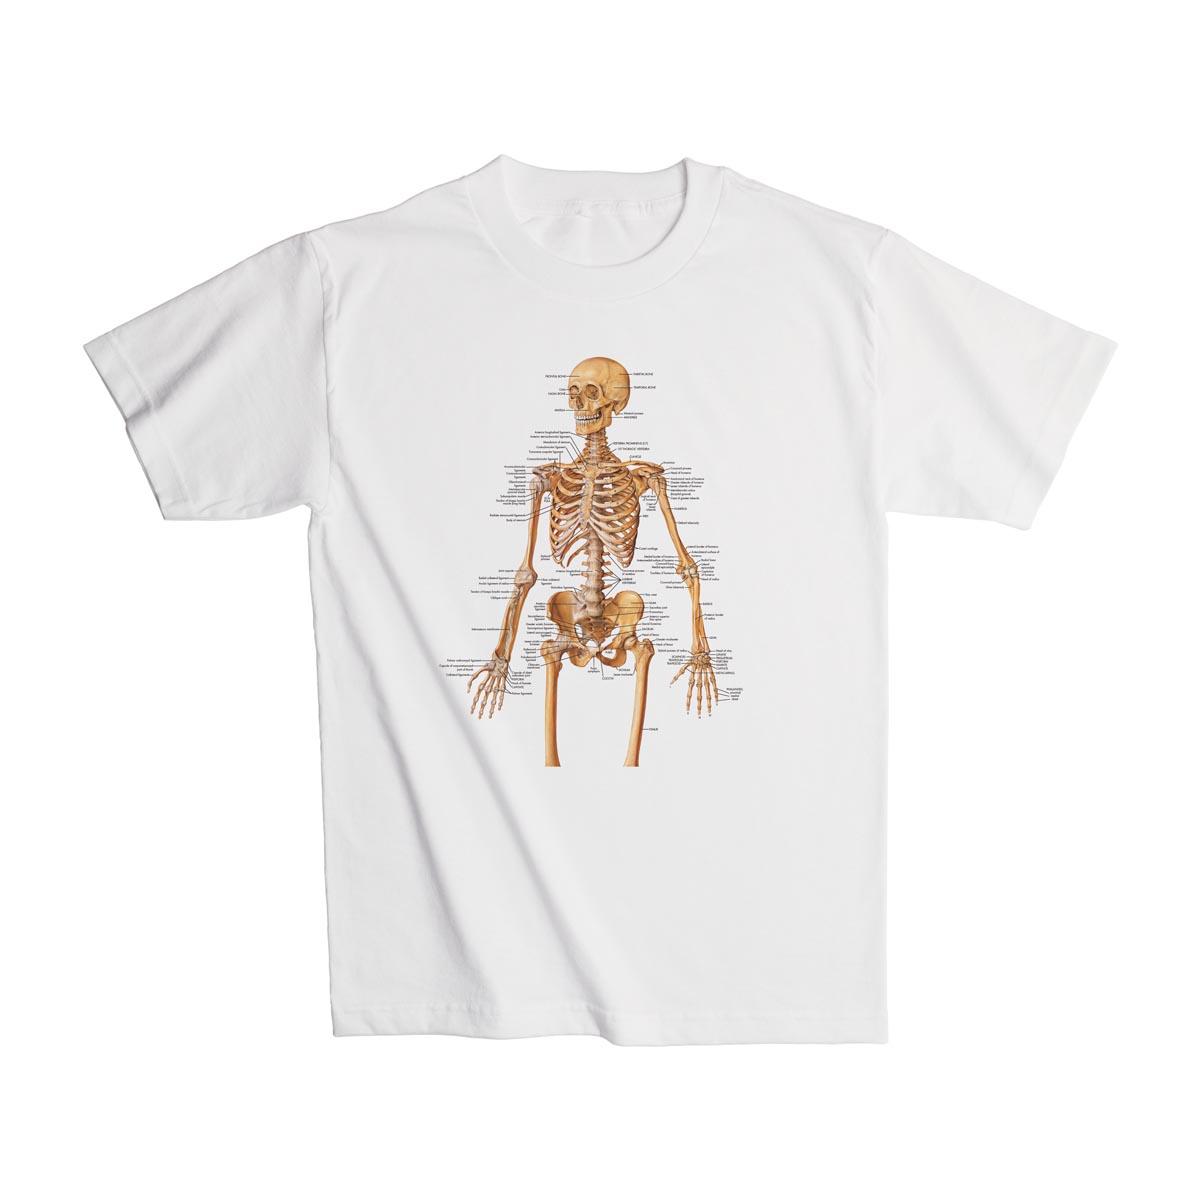 Geek Gifts Geek T Shirts Geek Tees Anatomy Shirts Science